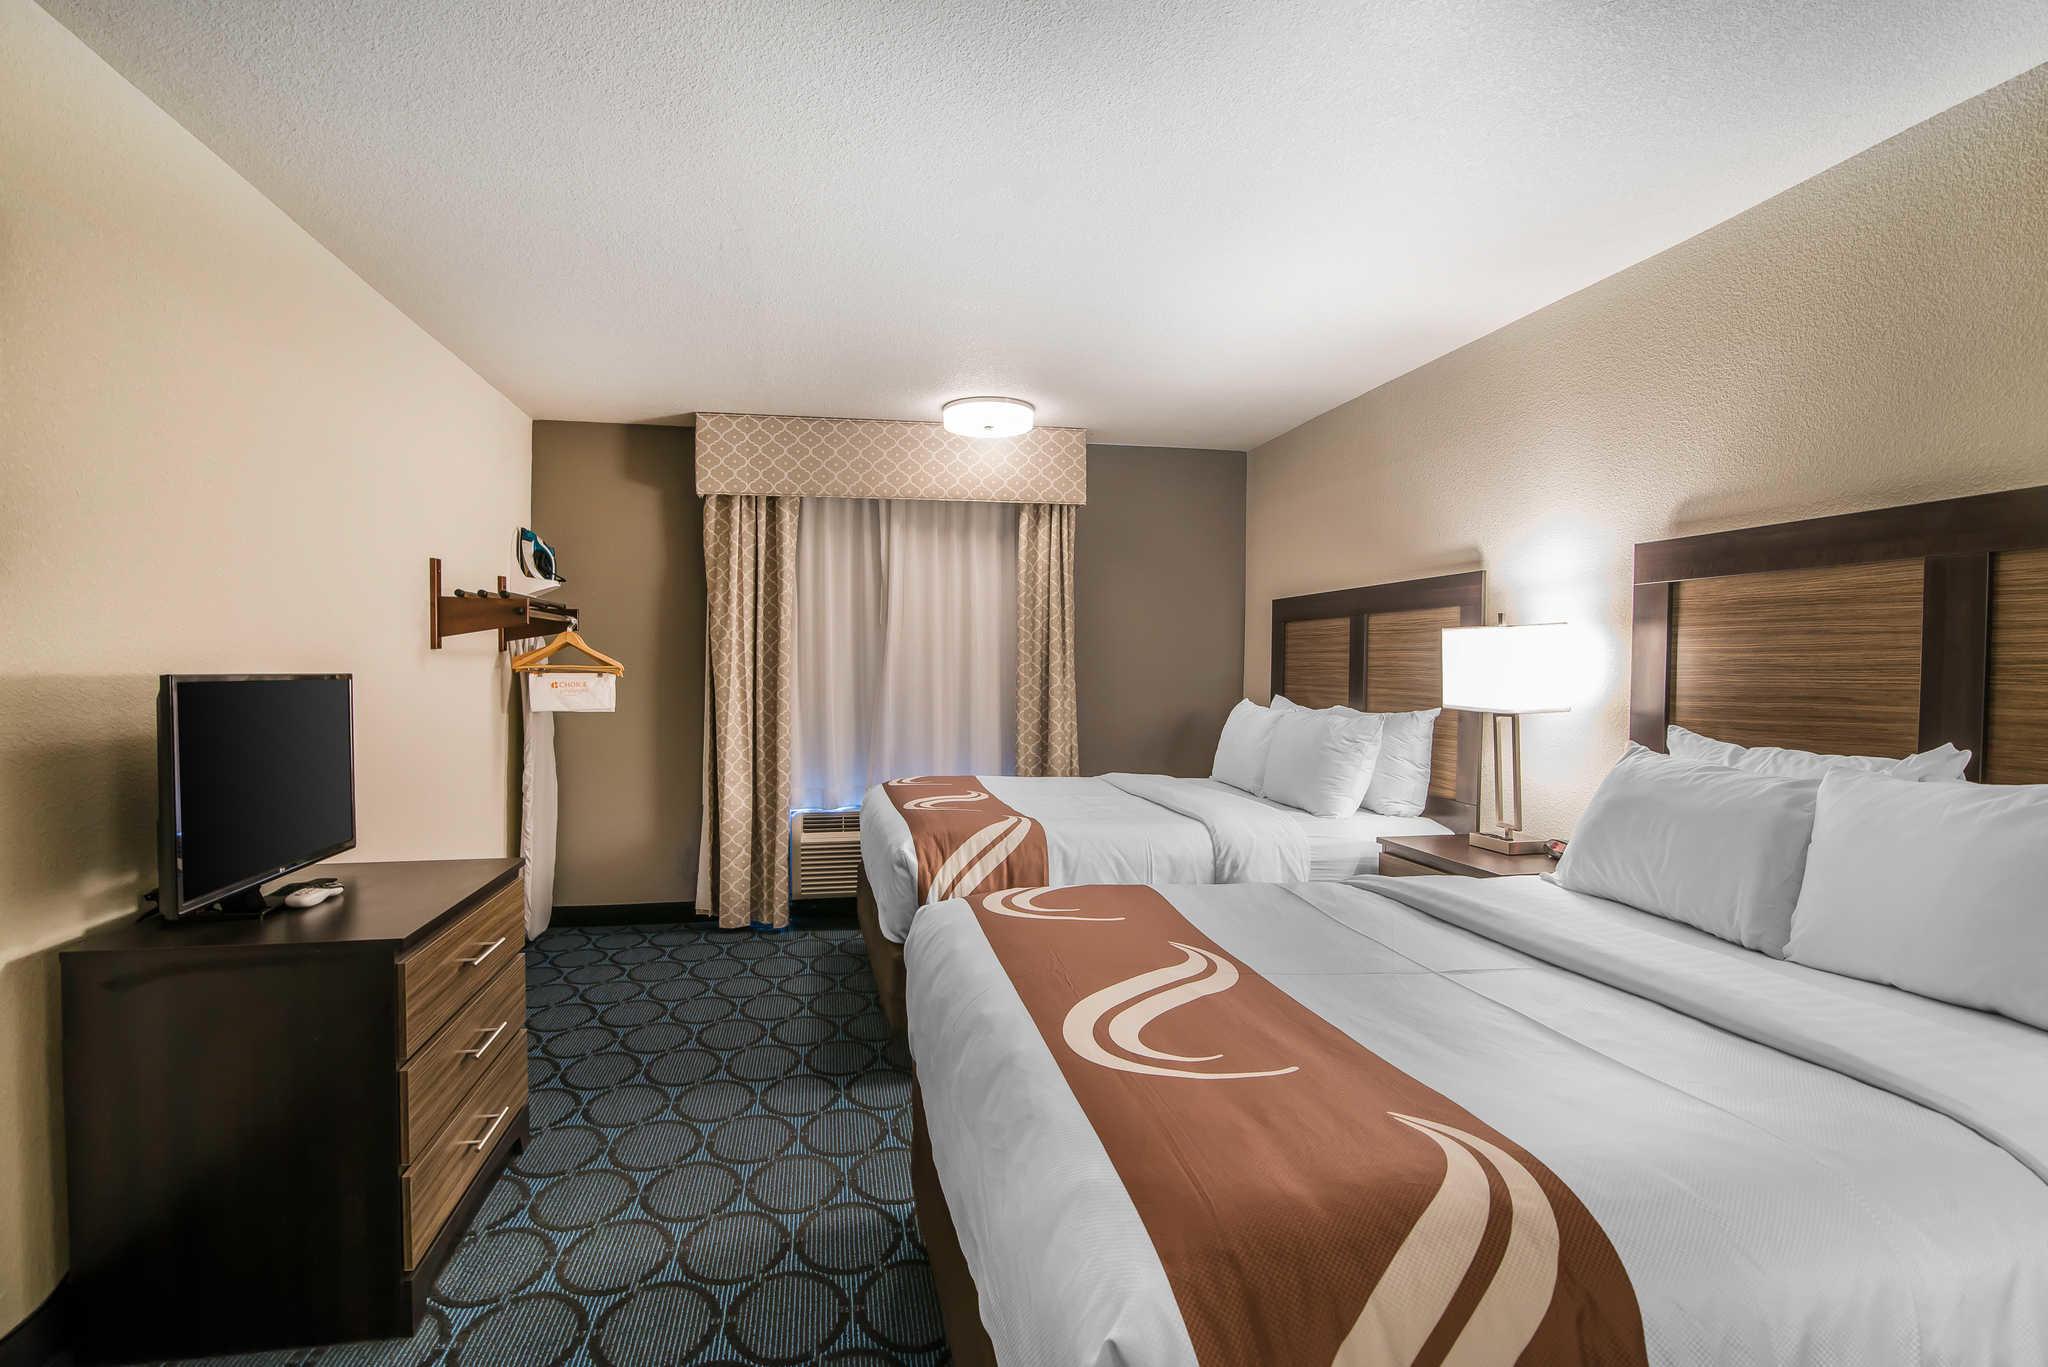 Quality Inn & Suites - Ruidoso Hwy 70 image 13